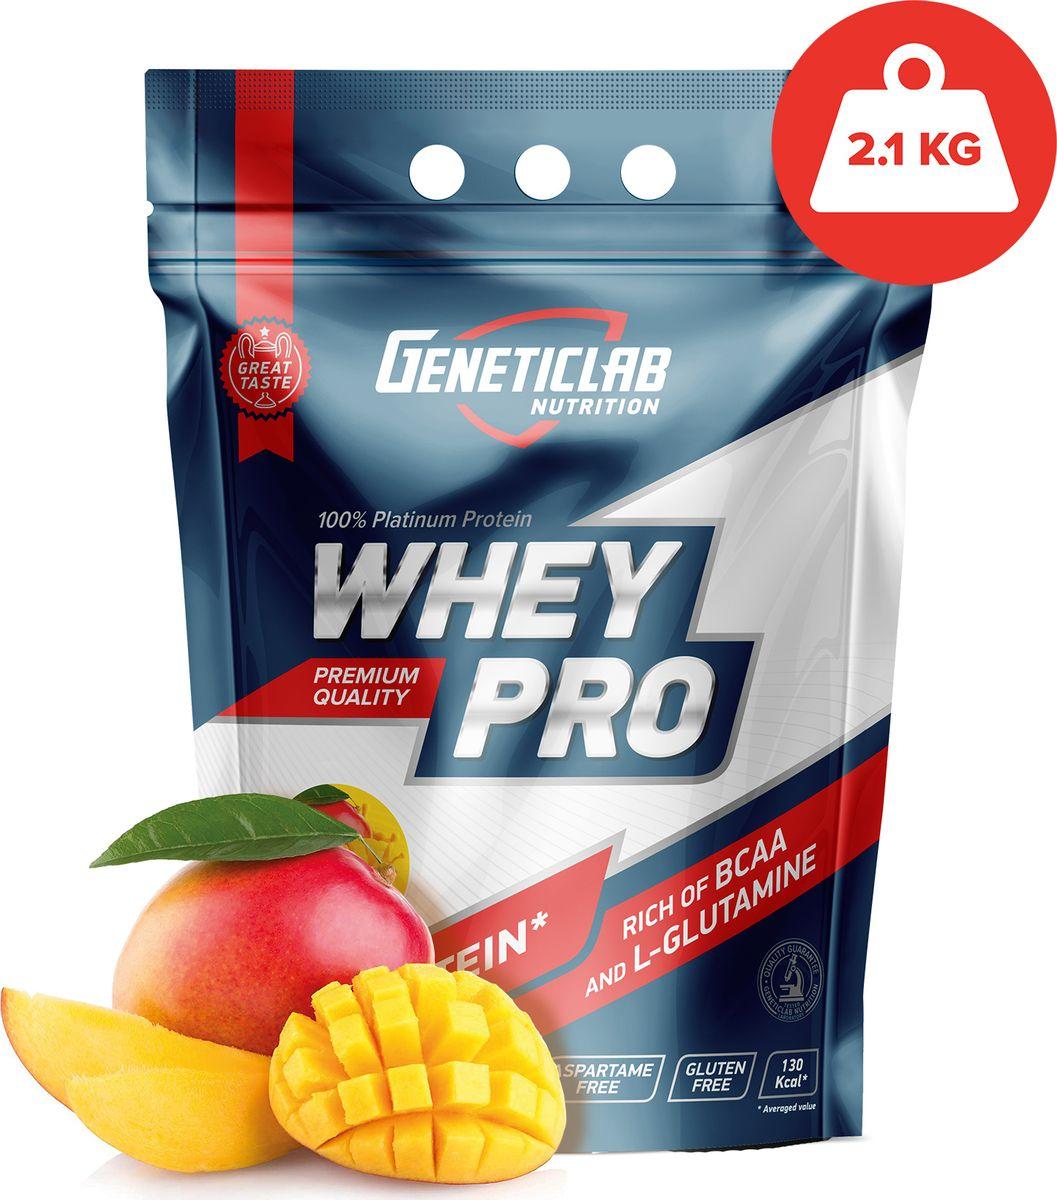 Протеин сывороточный Geneticlab Nutrition Whey Pro, манго, 2,1 кг цены